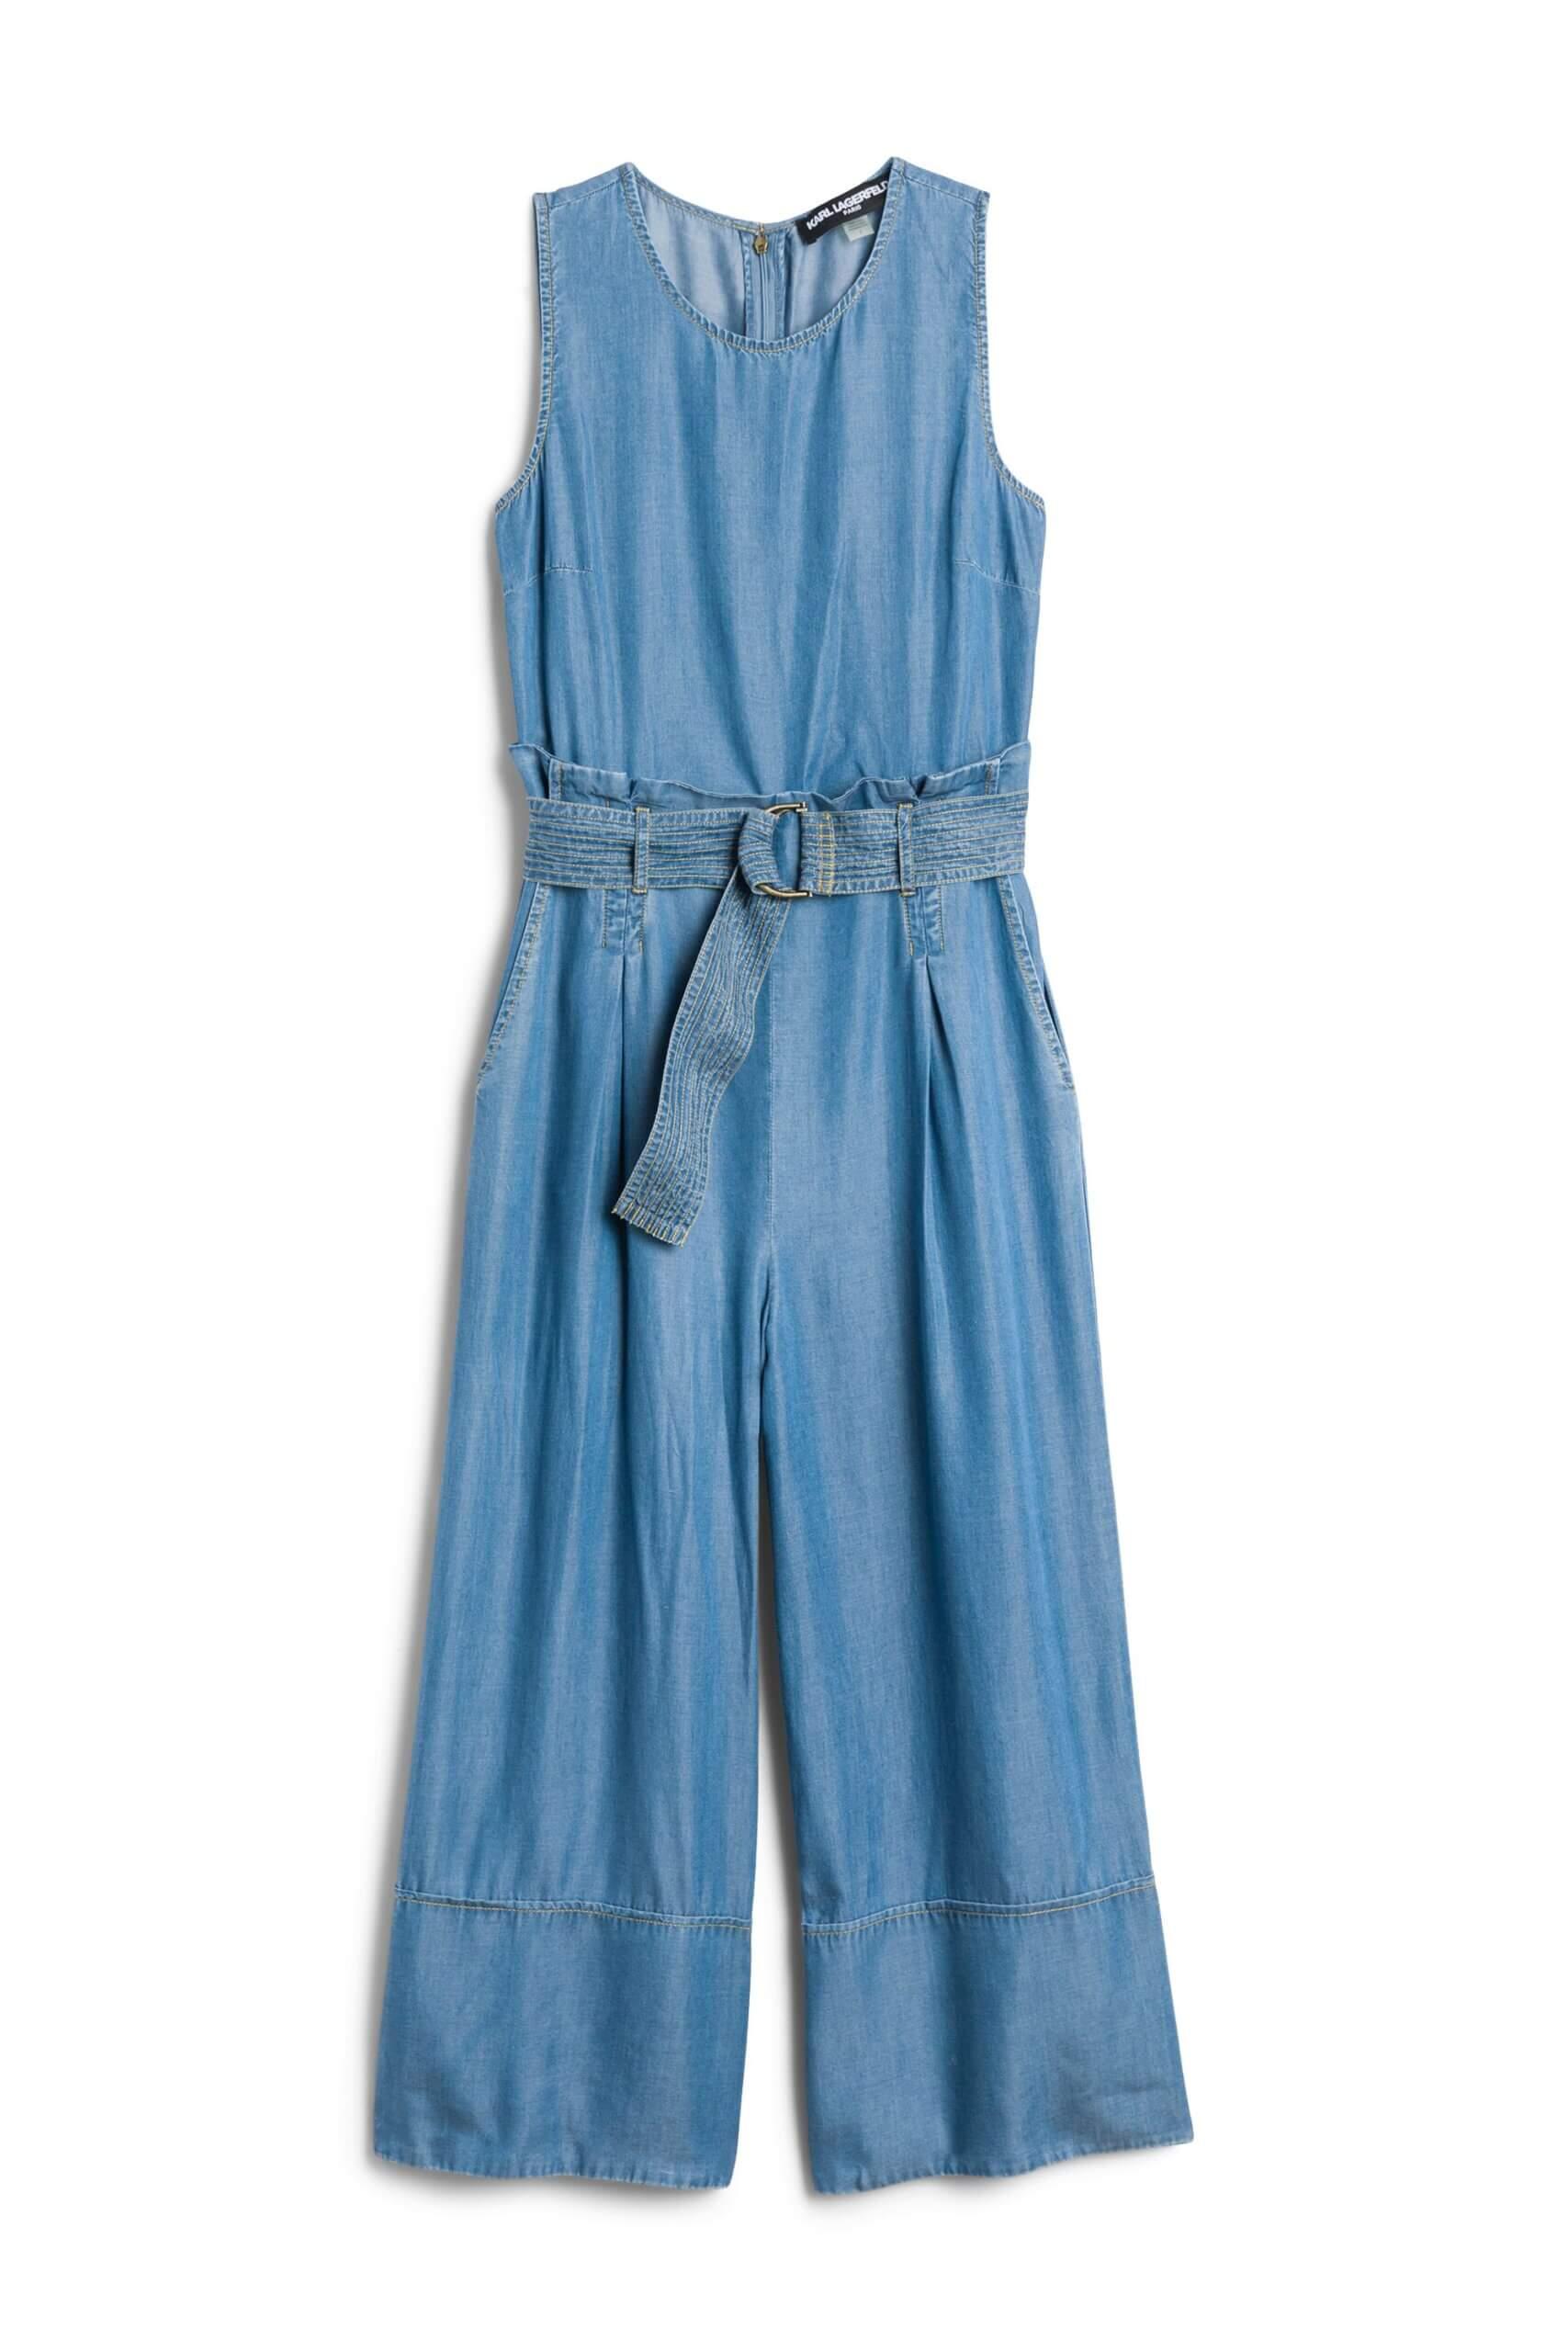 Stitch Fix Women's denim jumpsuit.